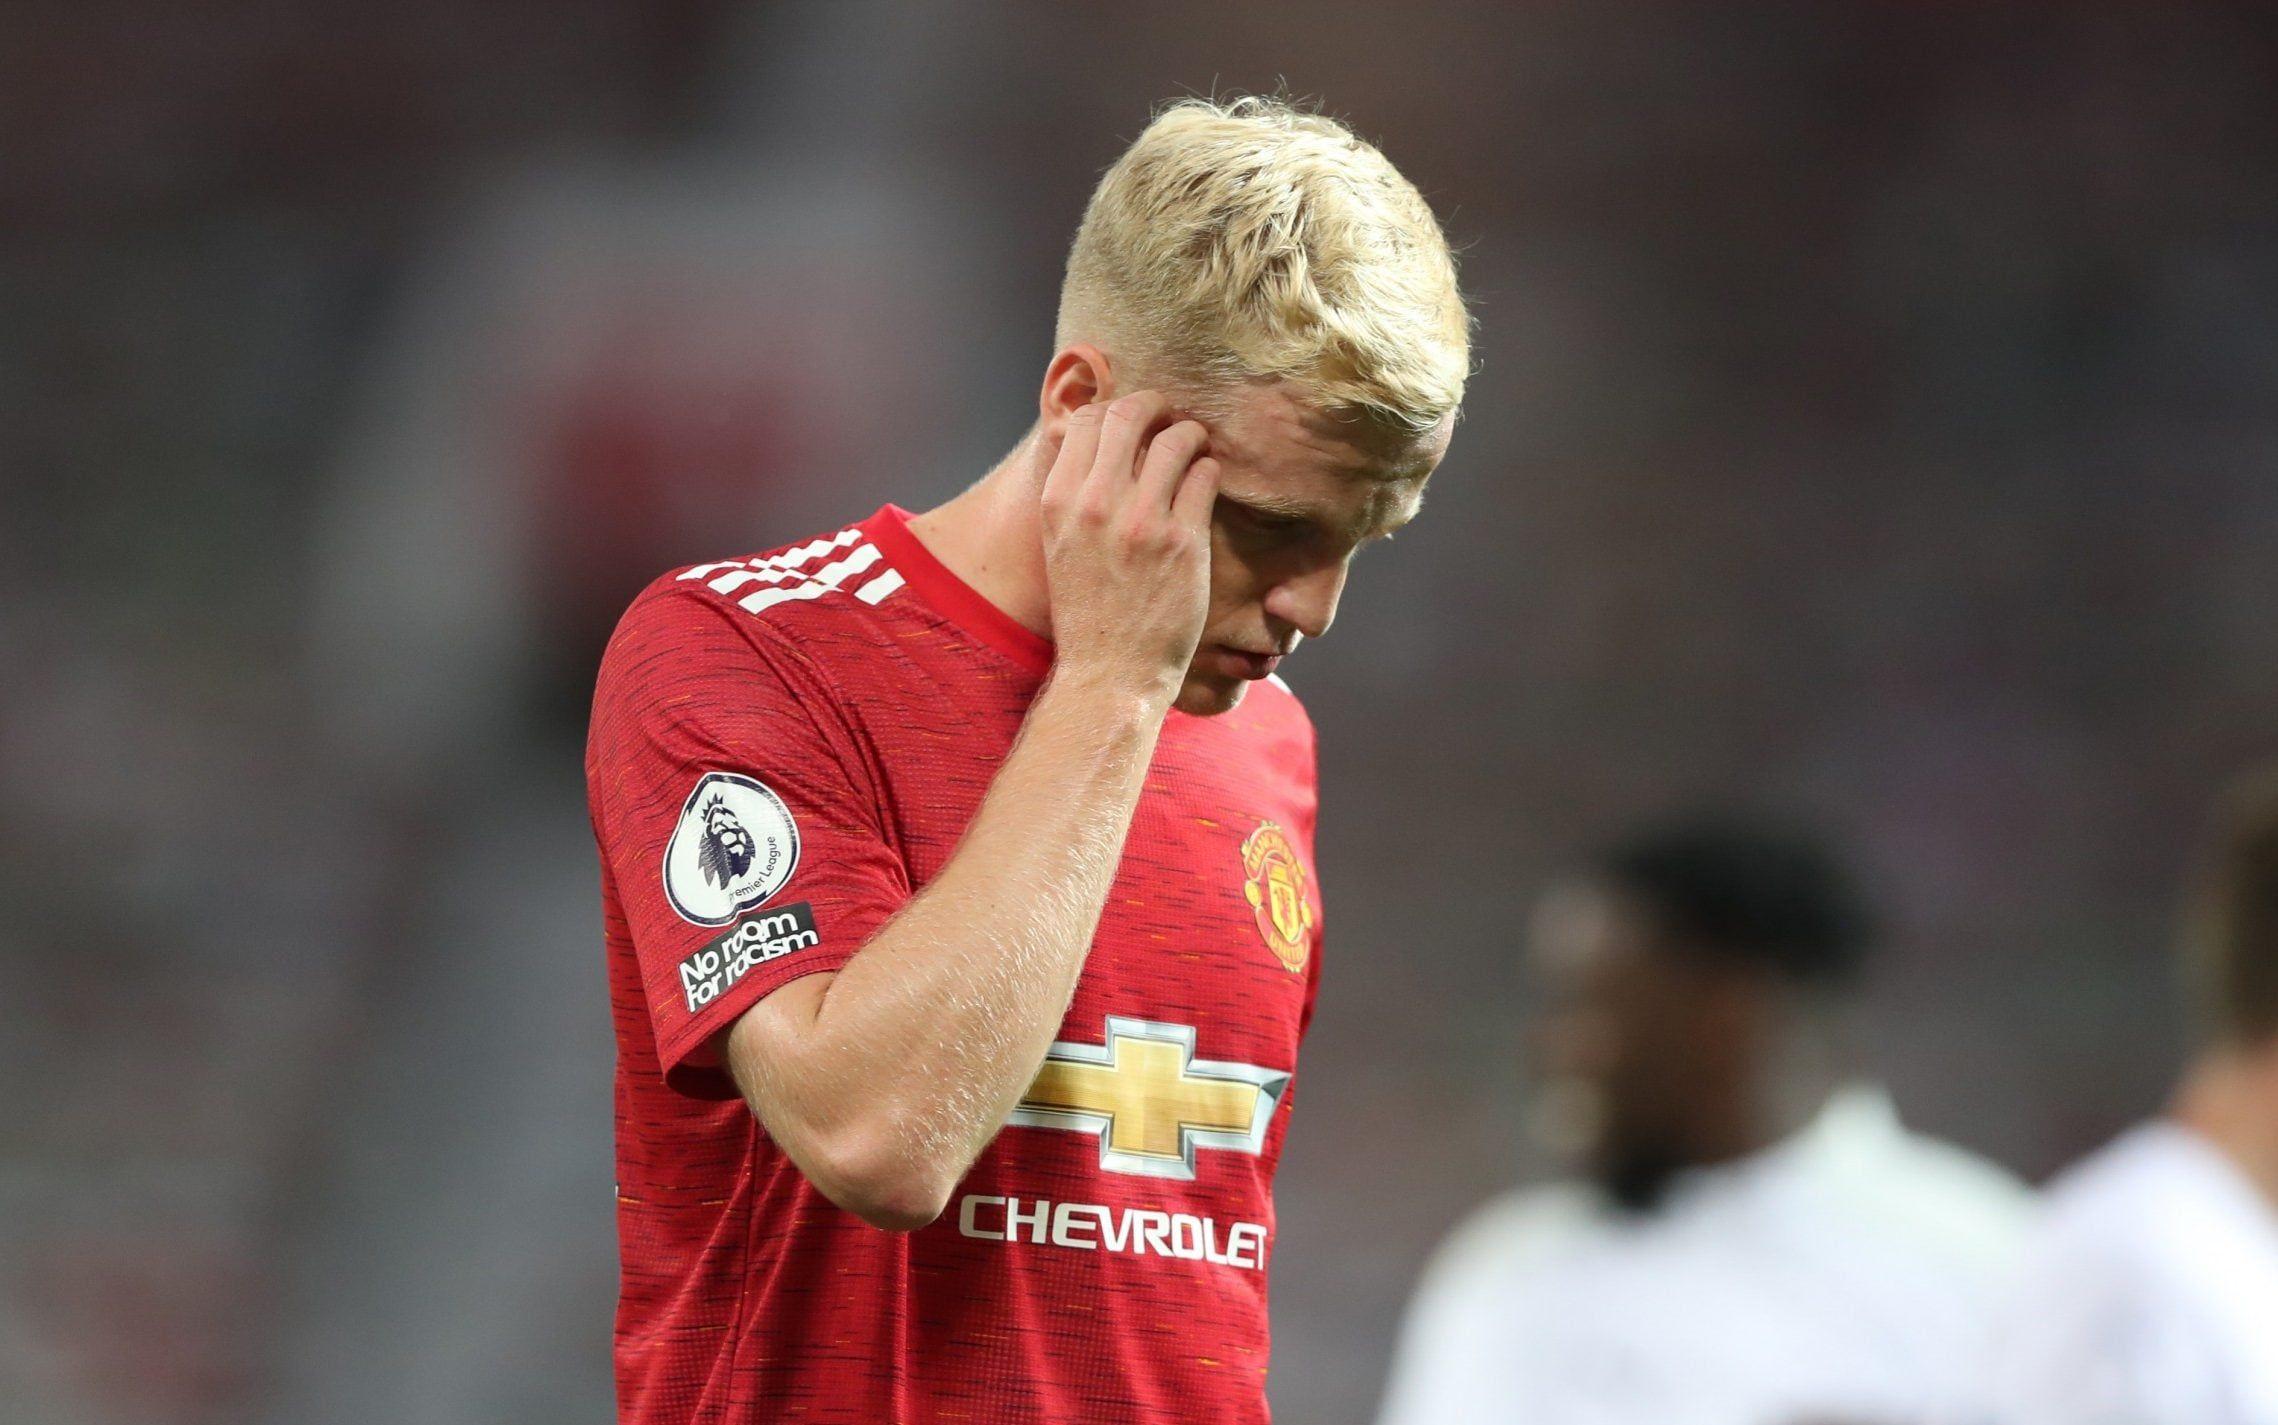 هلند / لیگ برتر / منچستریونایتد / Manchester United / Premier League / Netherlands